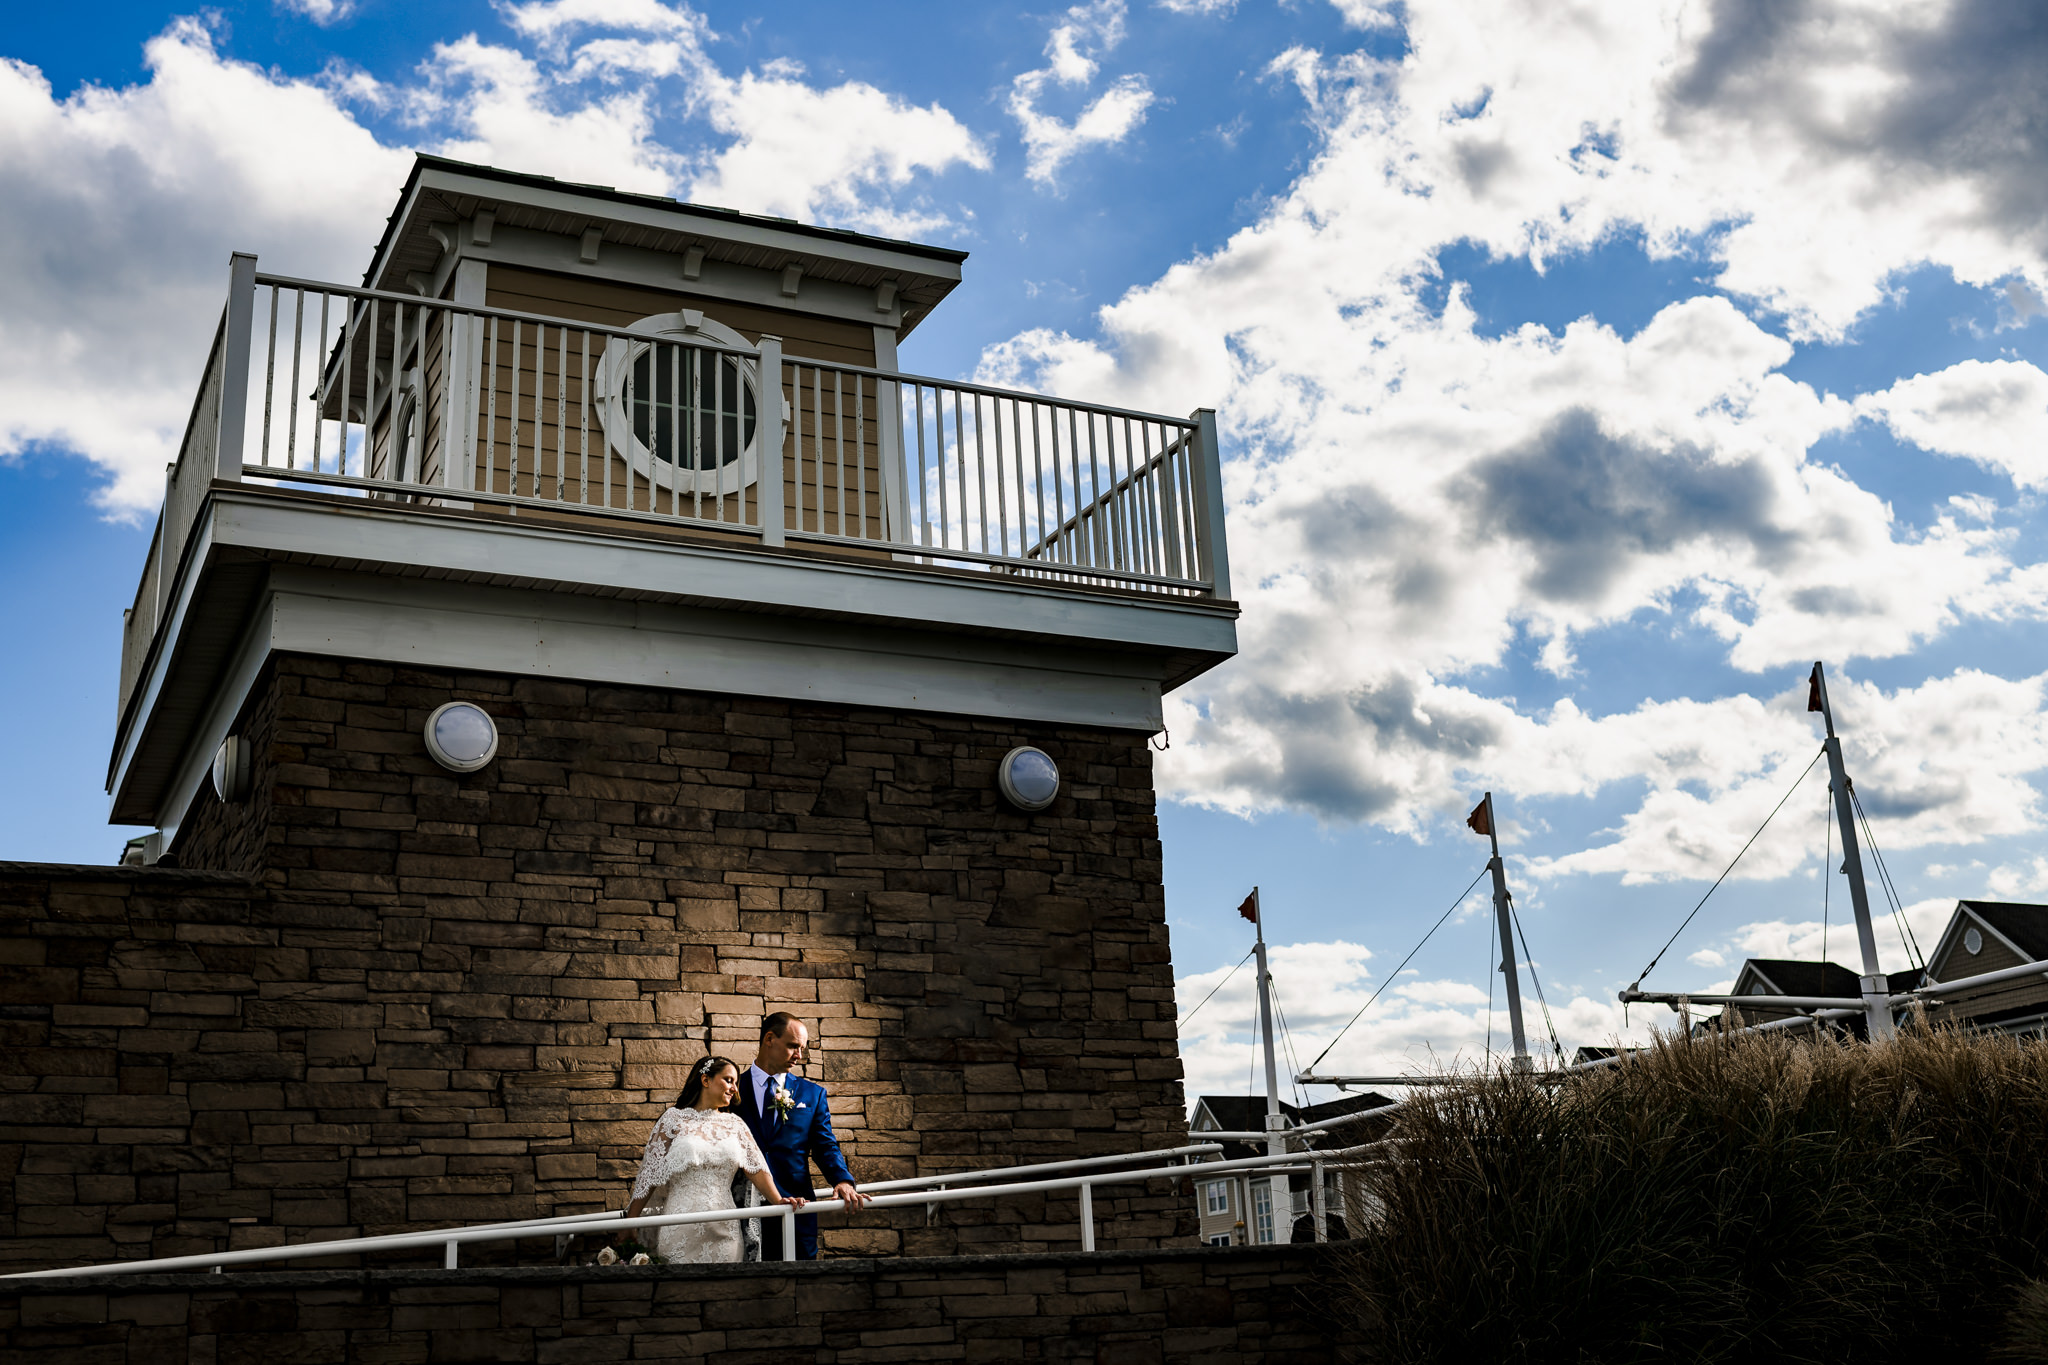 Culos-Sheraton-Eatontown-Long-Branch-Wedding-Photographer-14.JPG